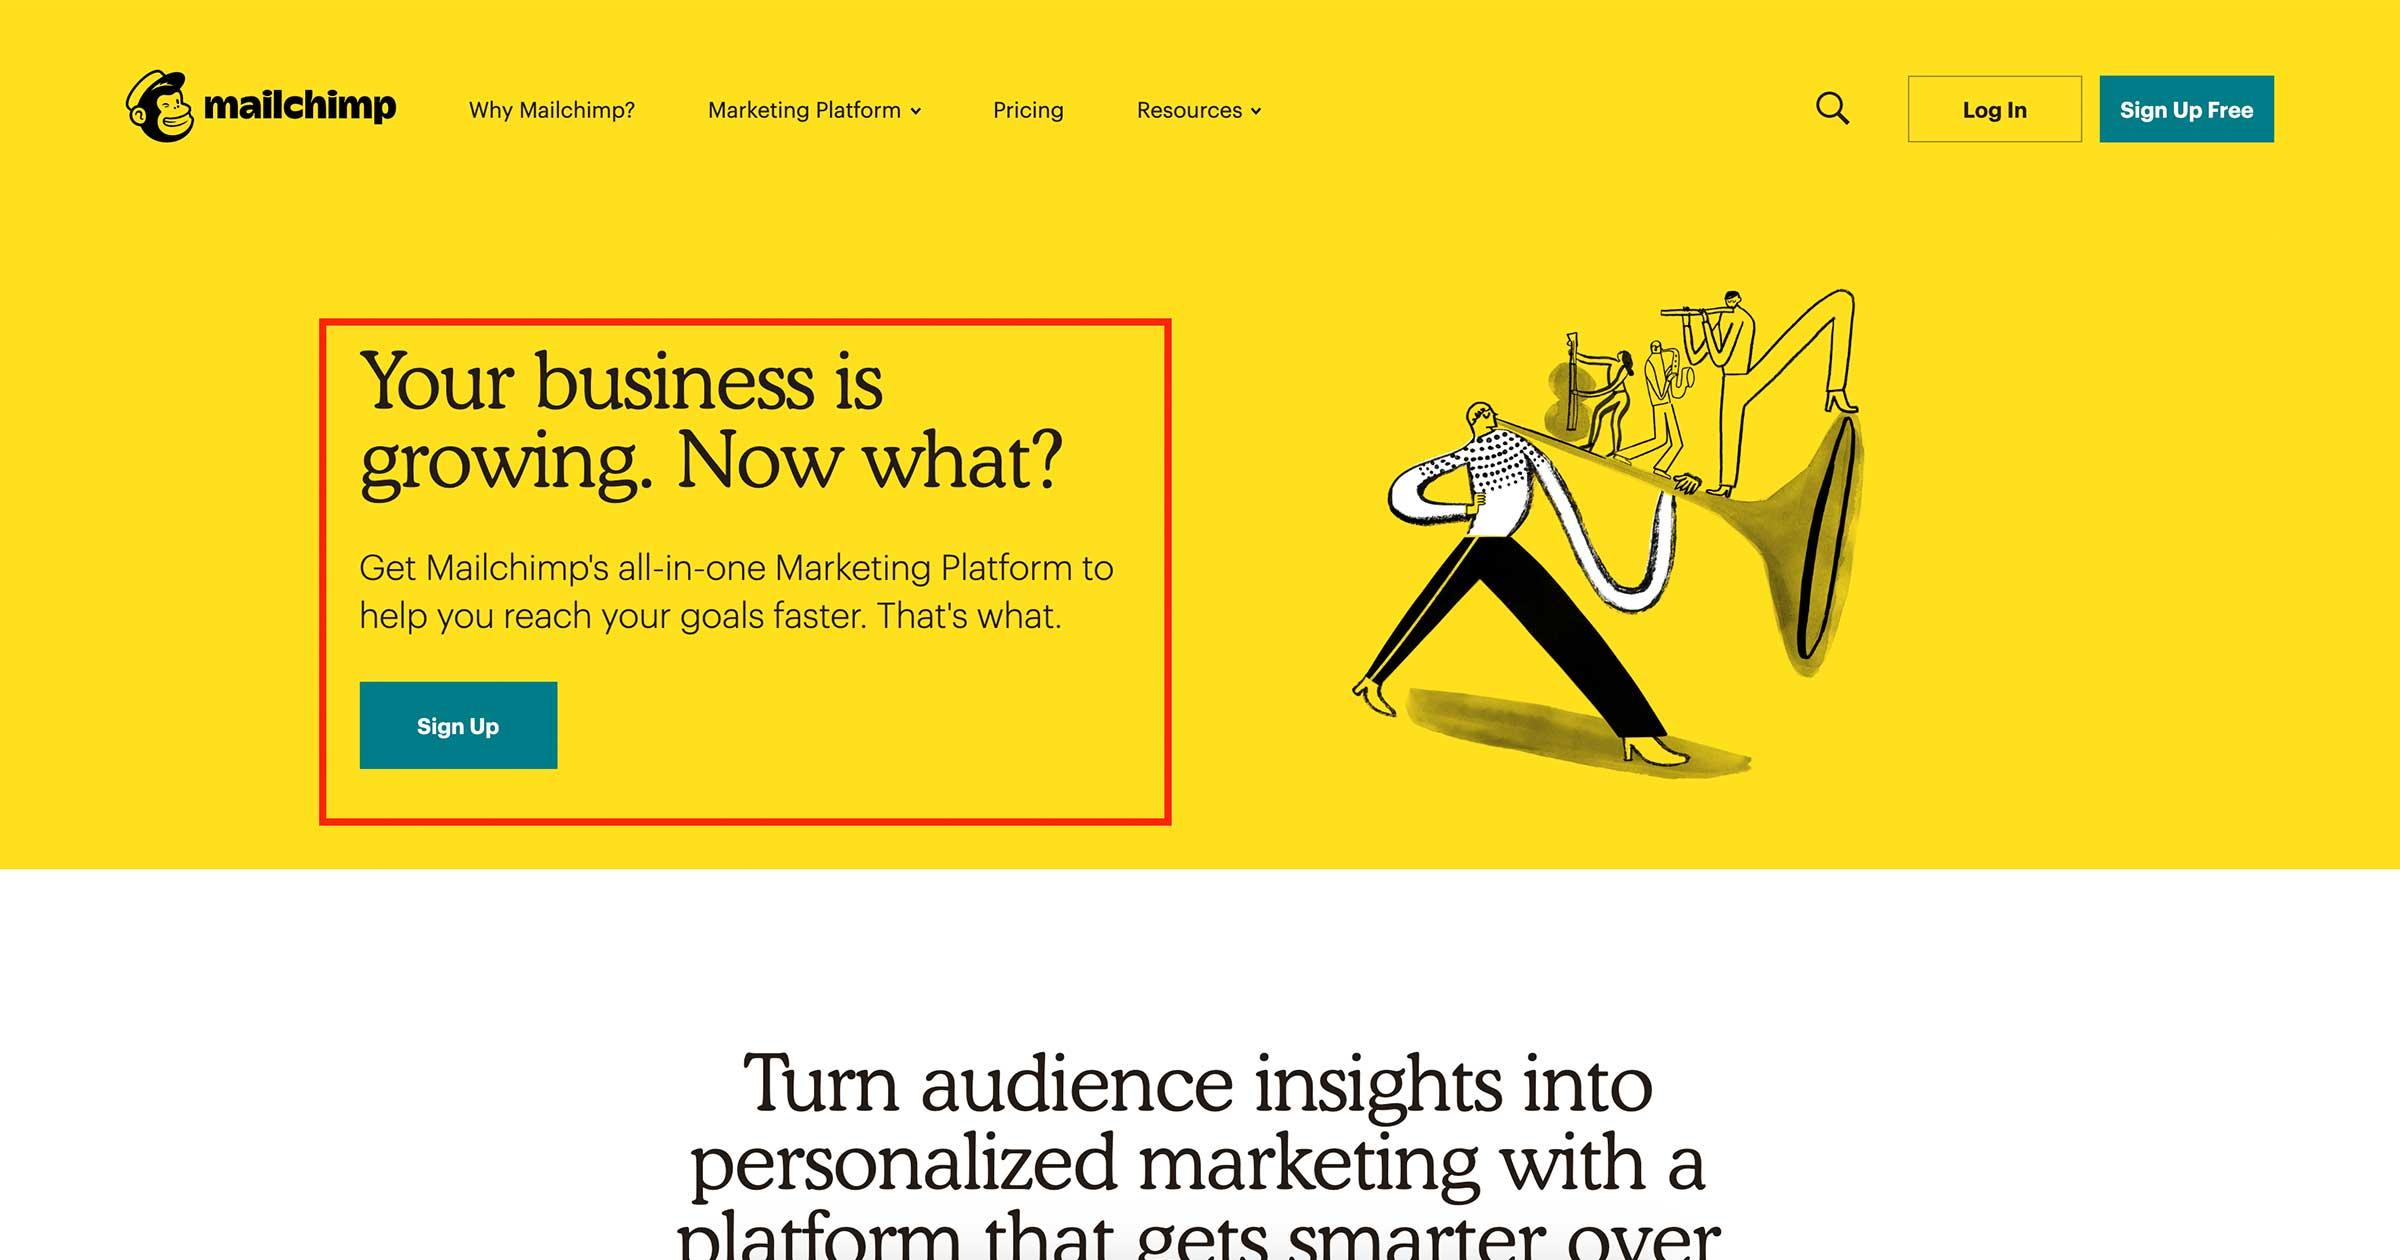 mailchimp marketing platform page